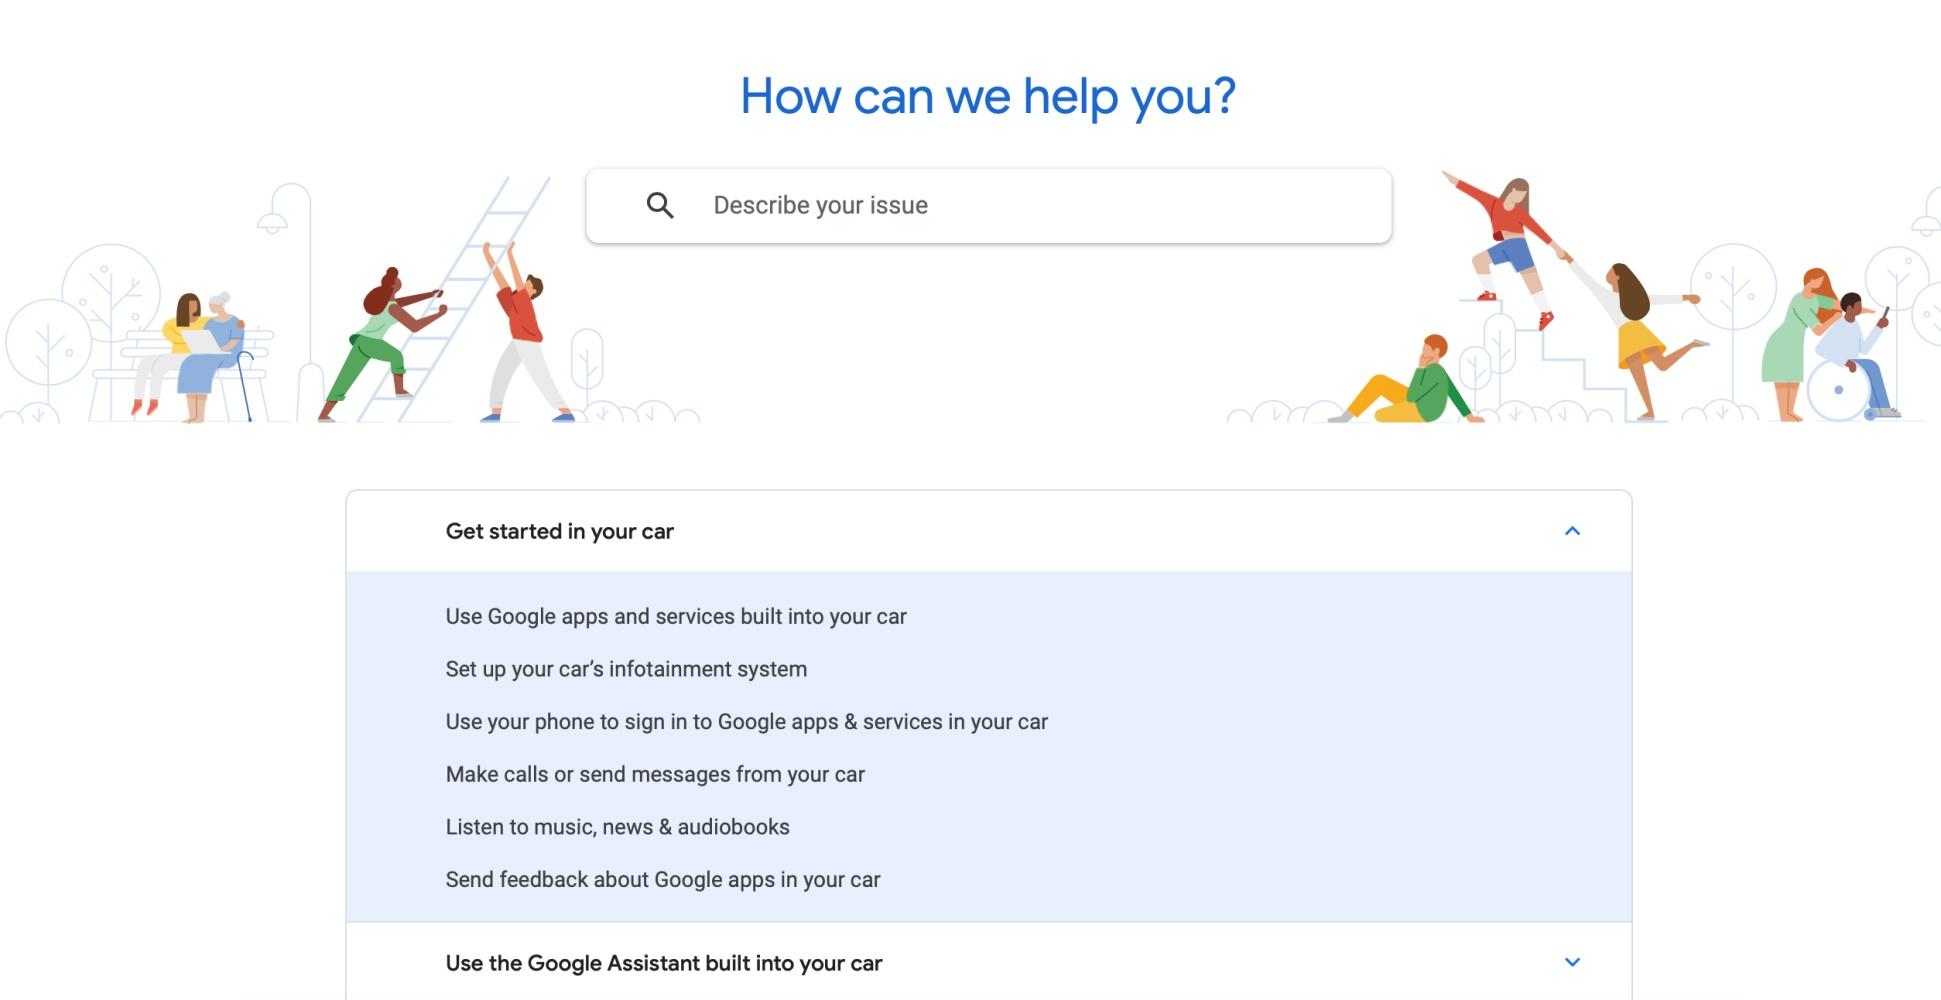 Android Automotive pomoc techniczna